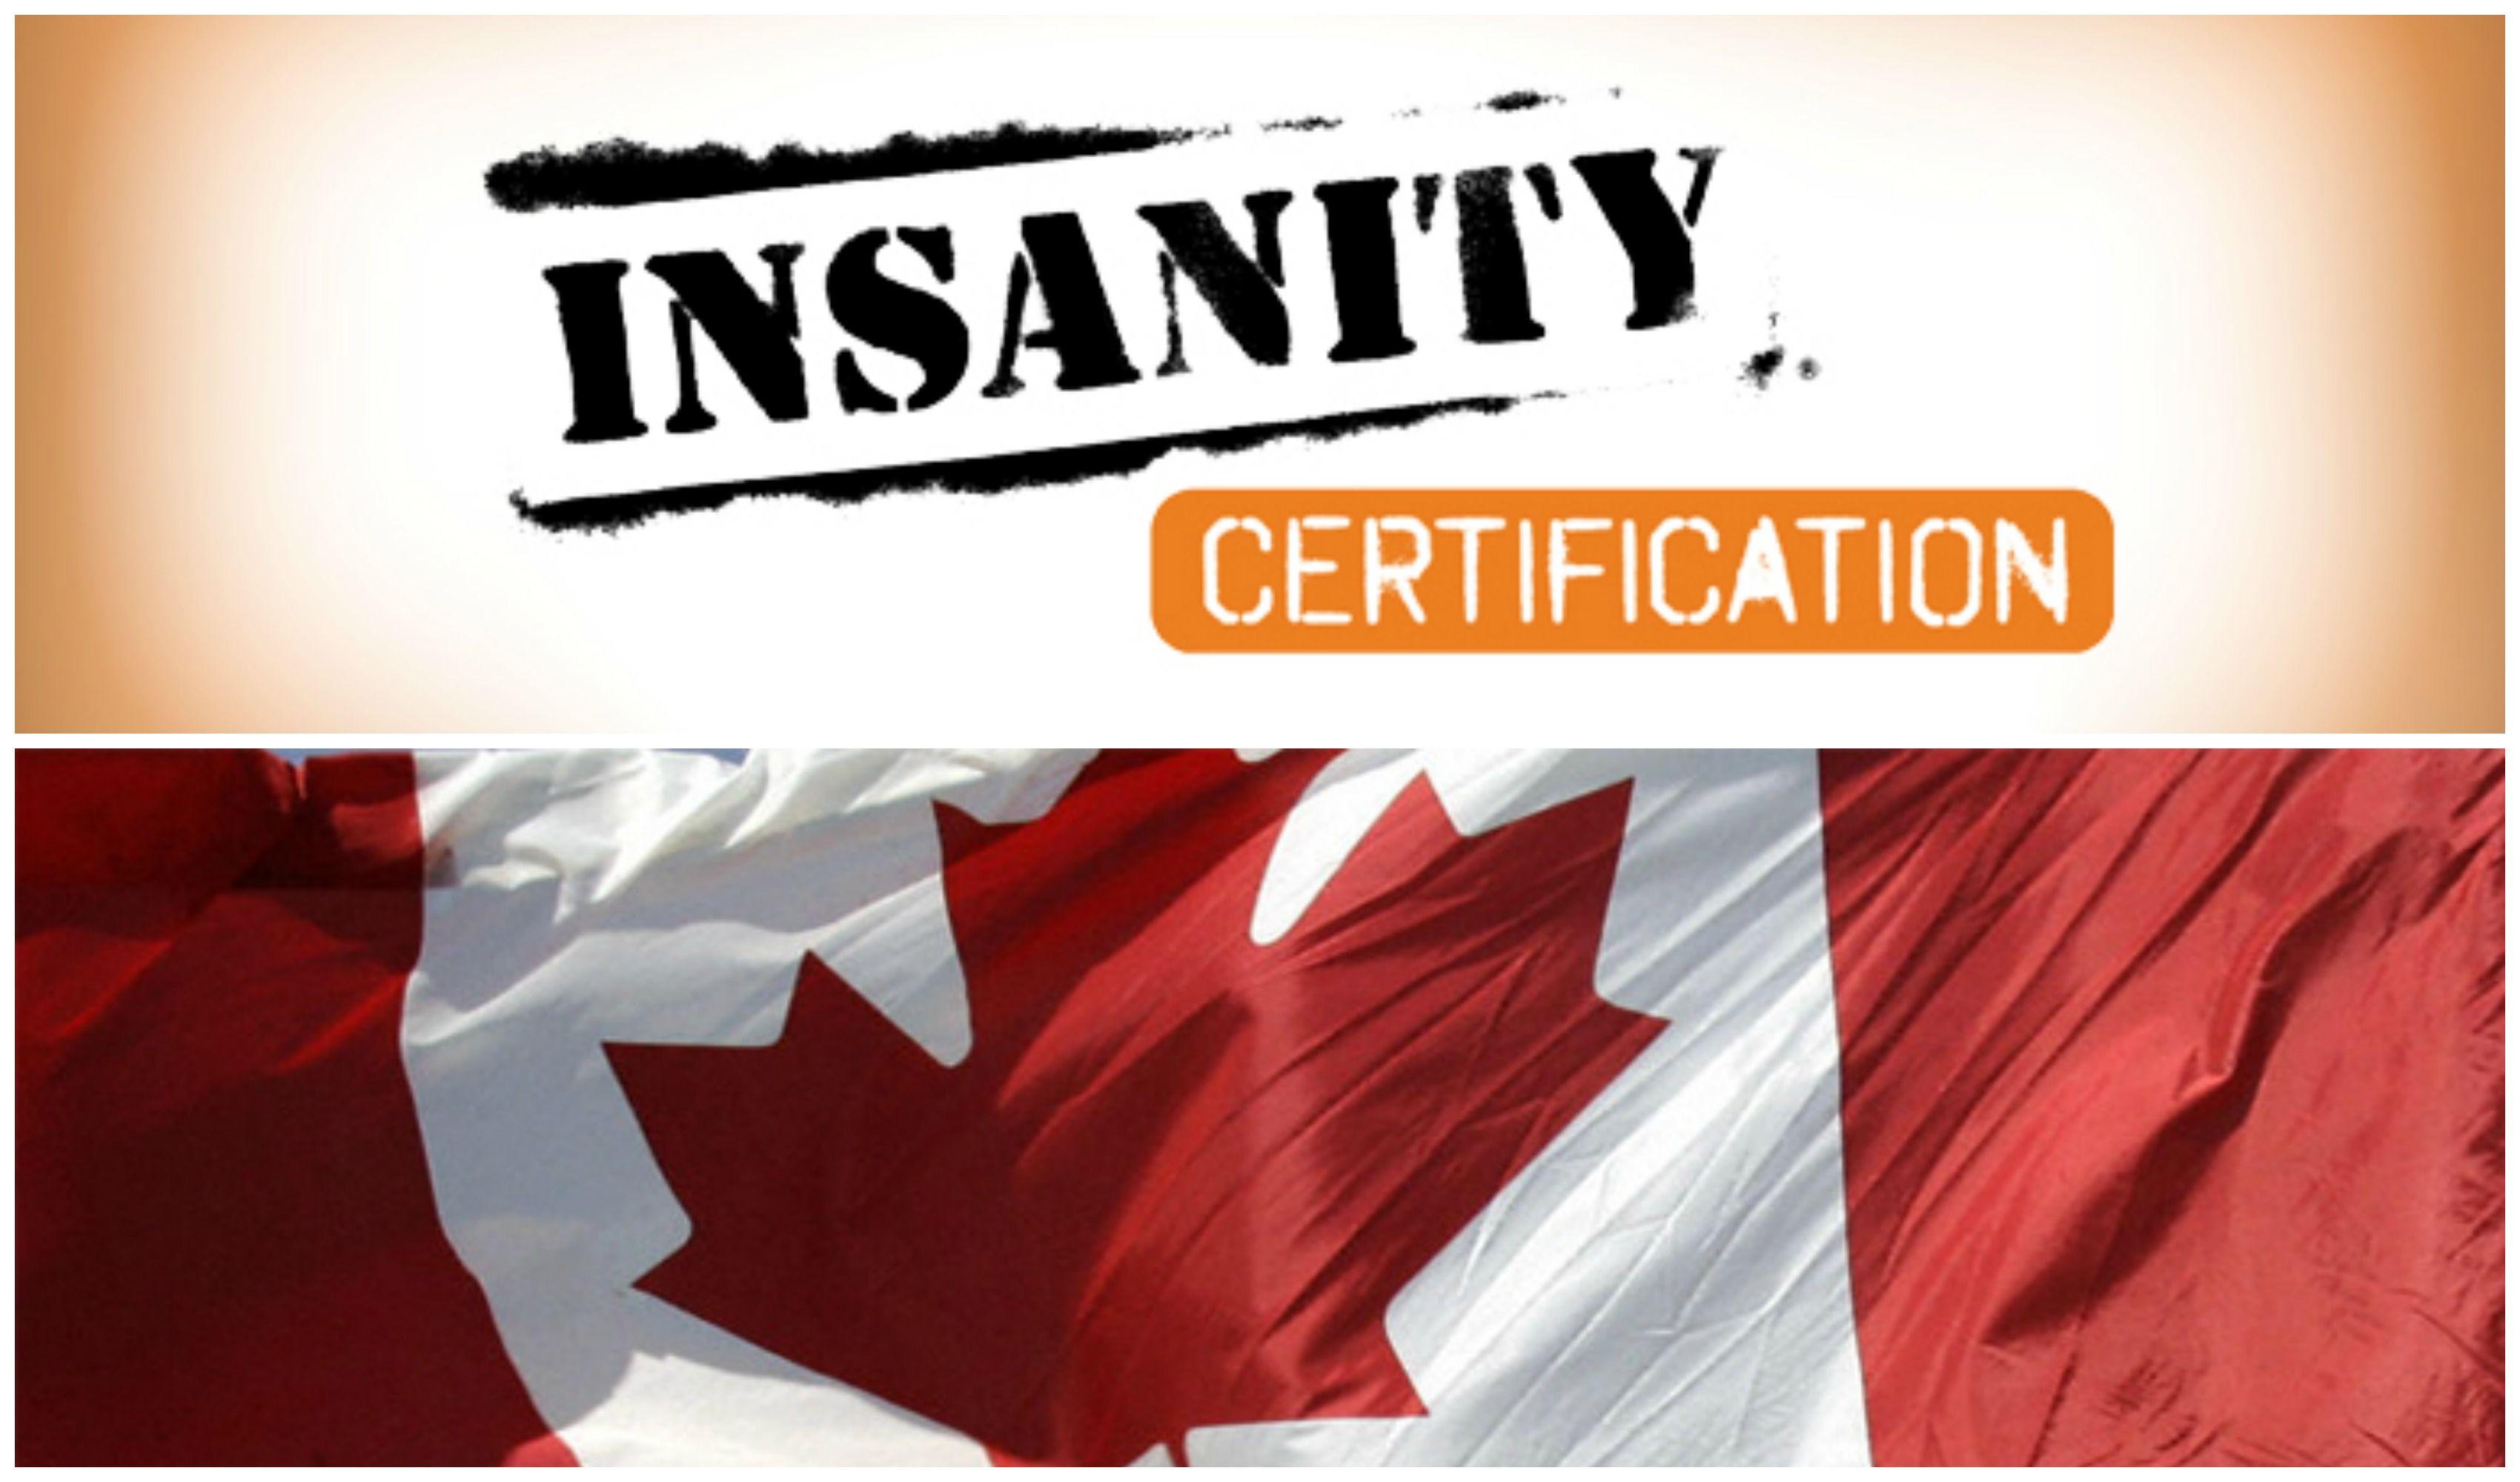 Insanity certification canada amaporte a ma porte pinterest insanity certification canada amaporte 1betcityfo Choice Image